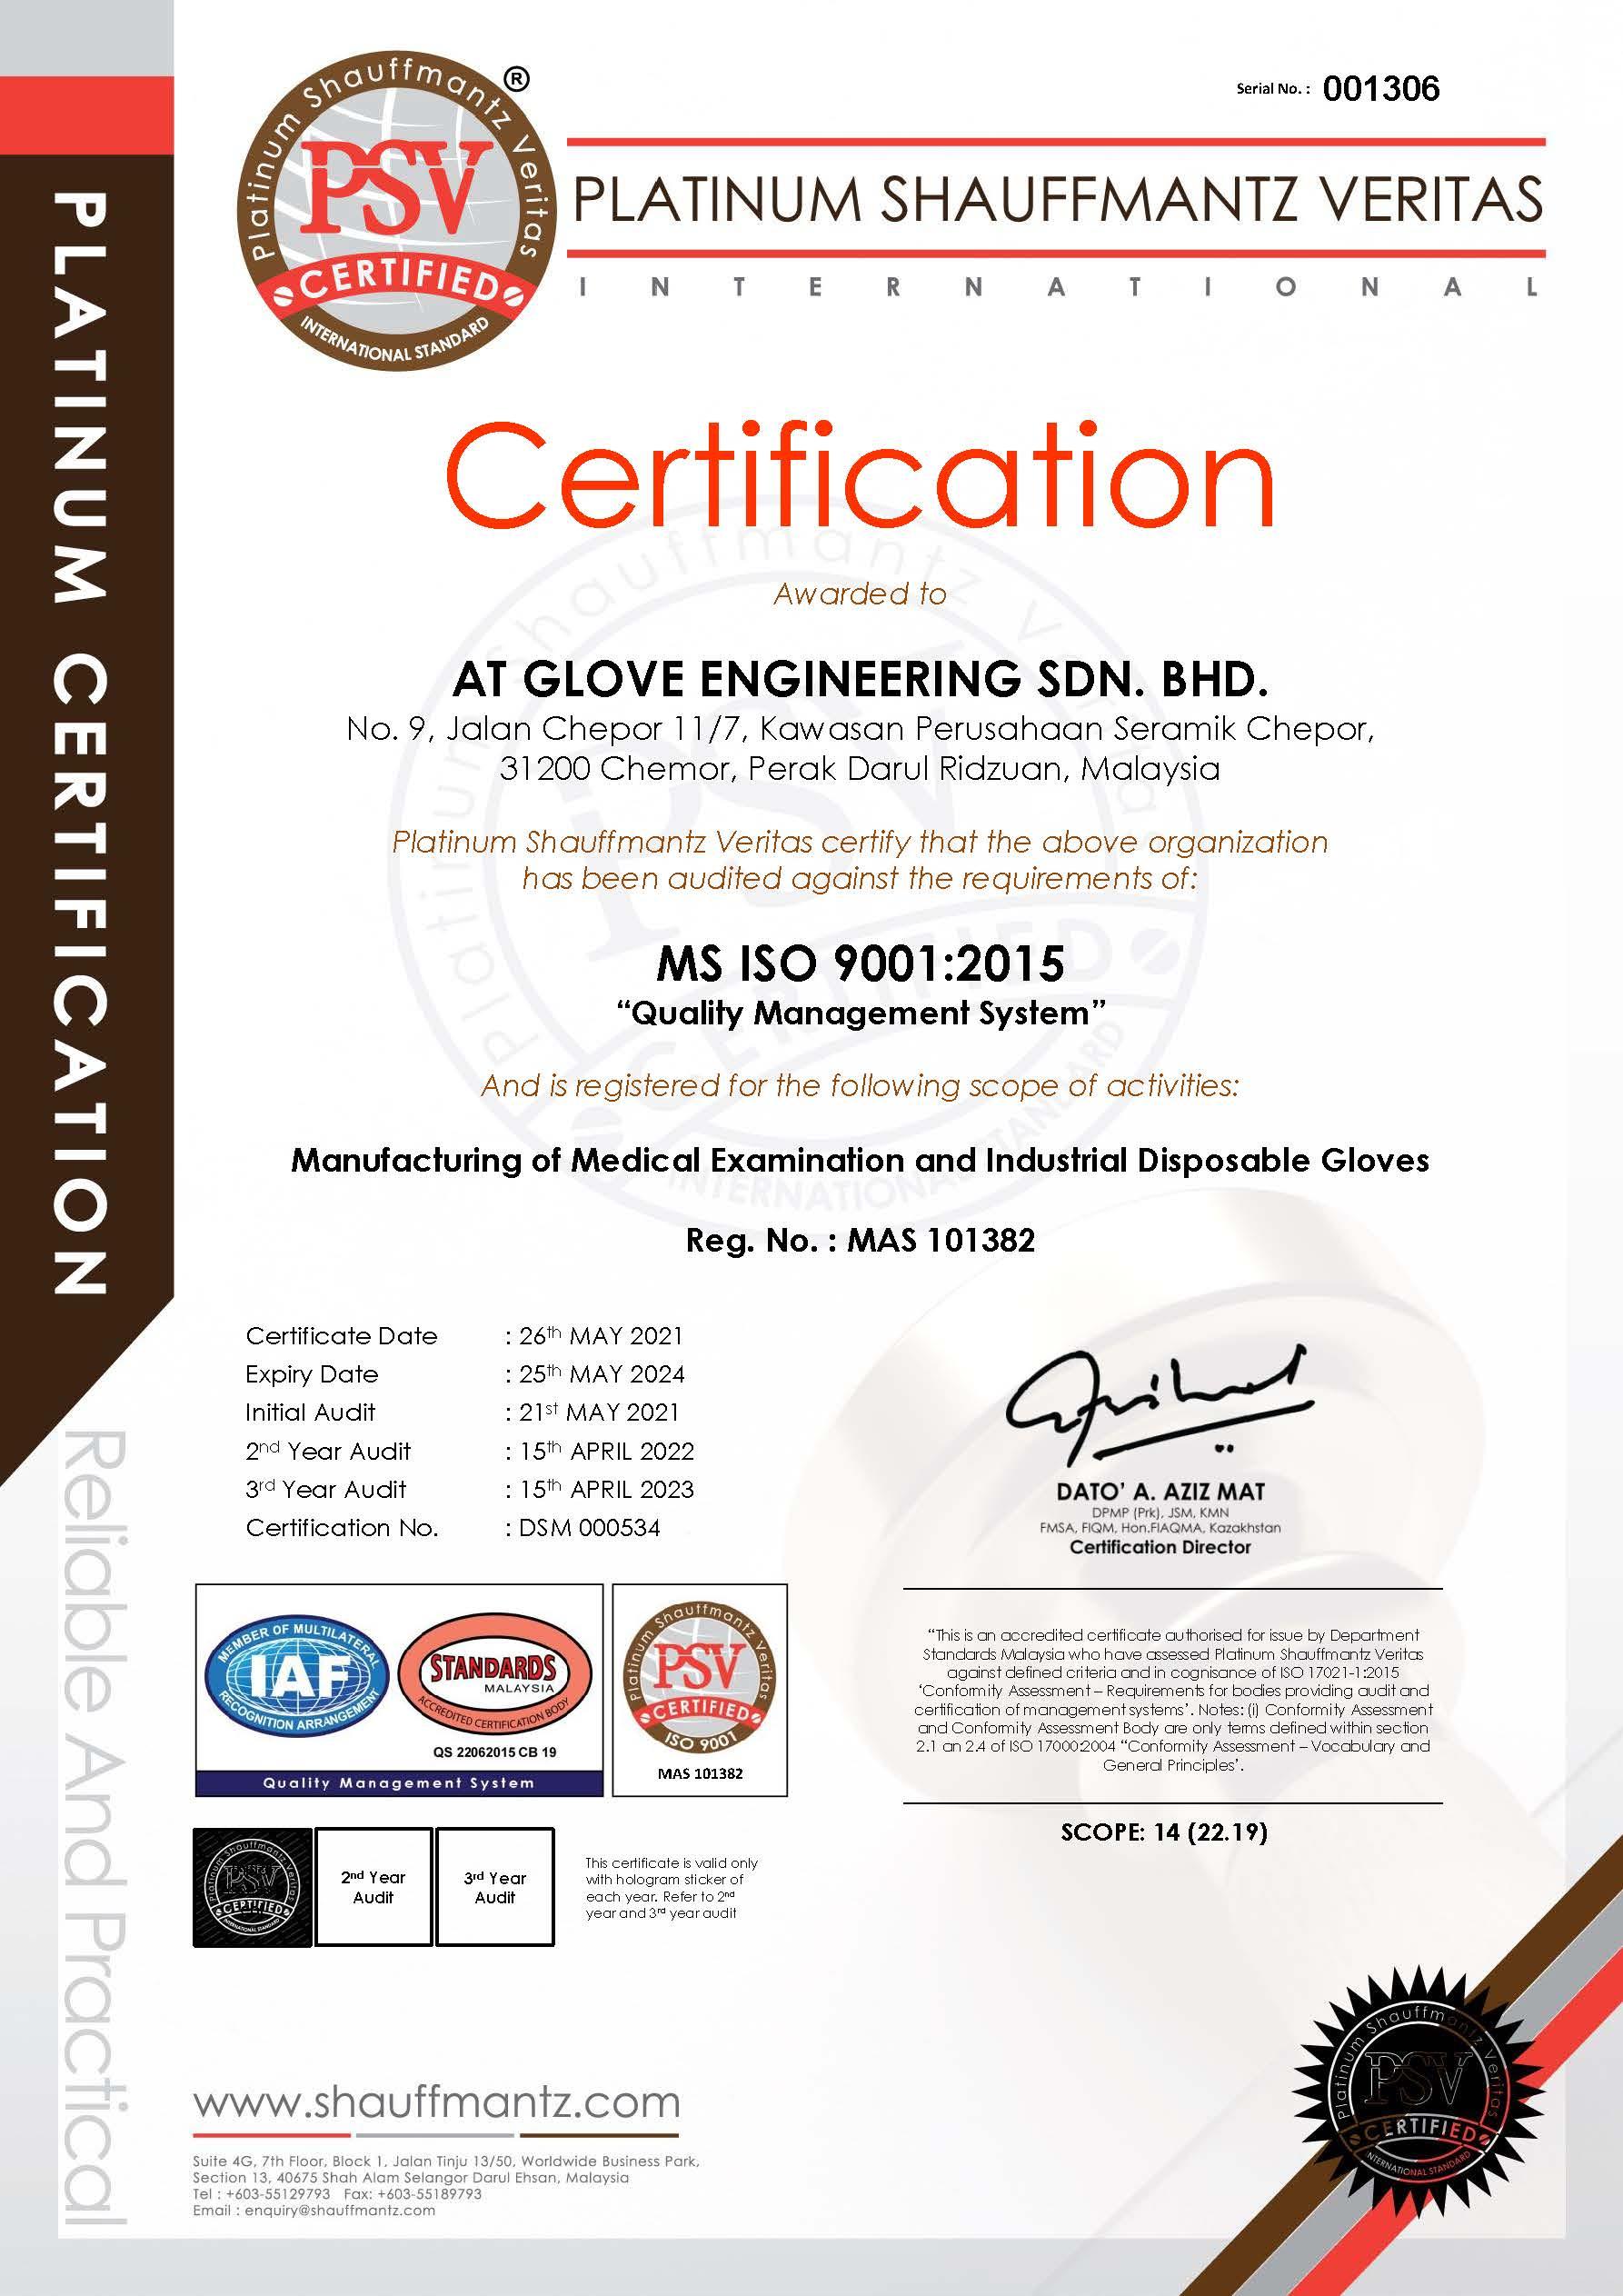 AT GLOVE ENGINEERING SDN BHD - ISO 9001